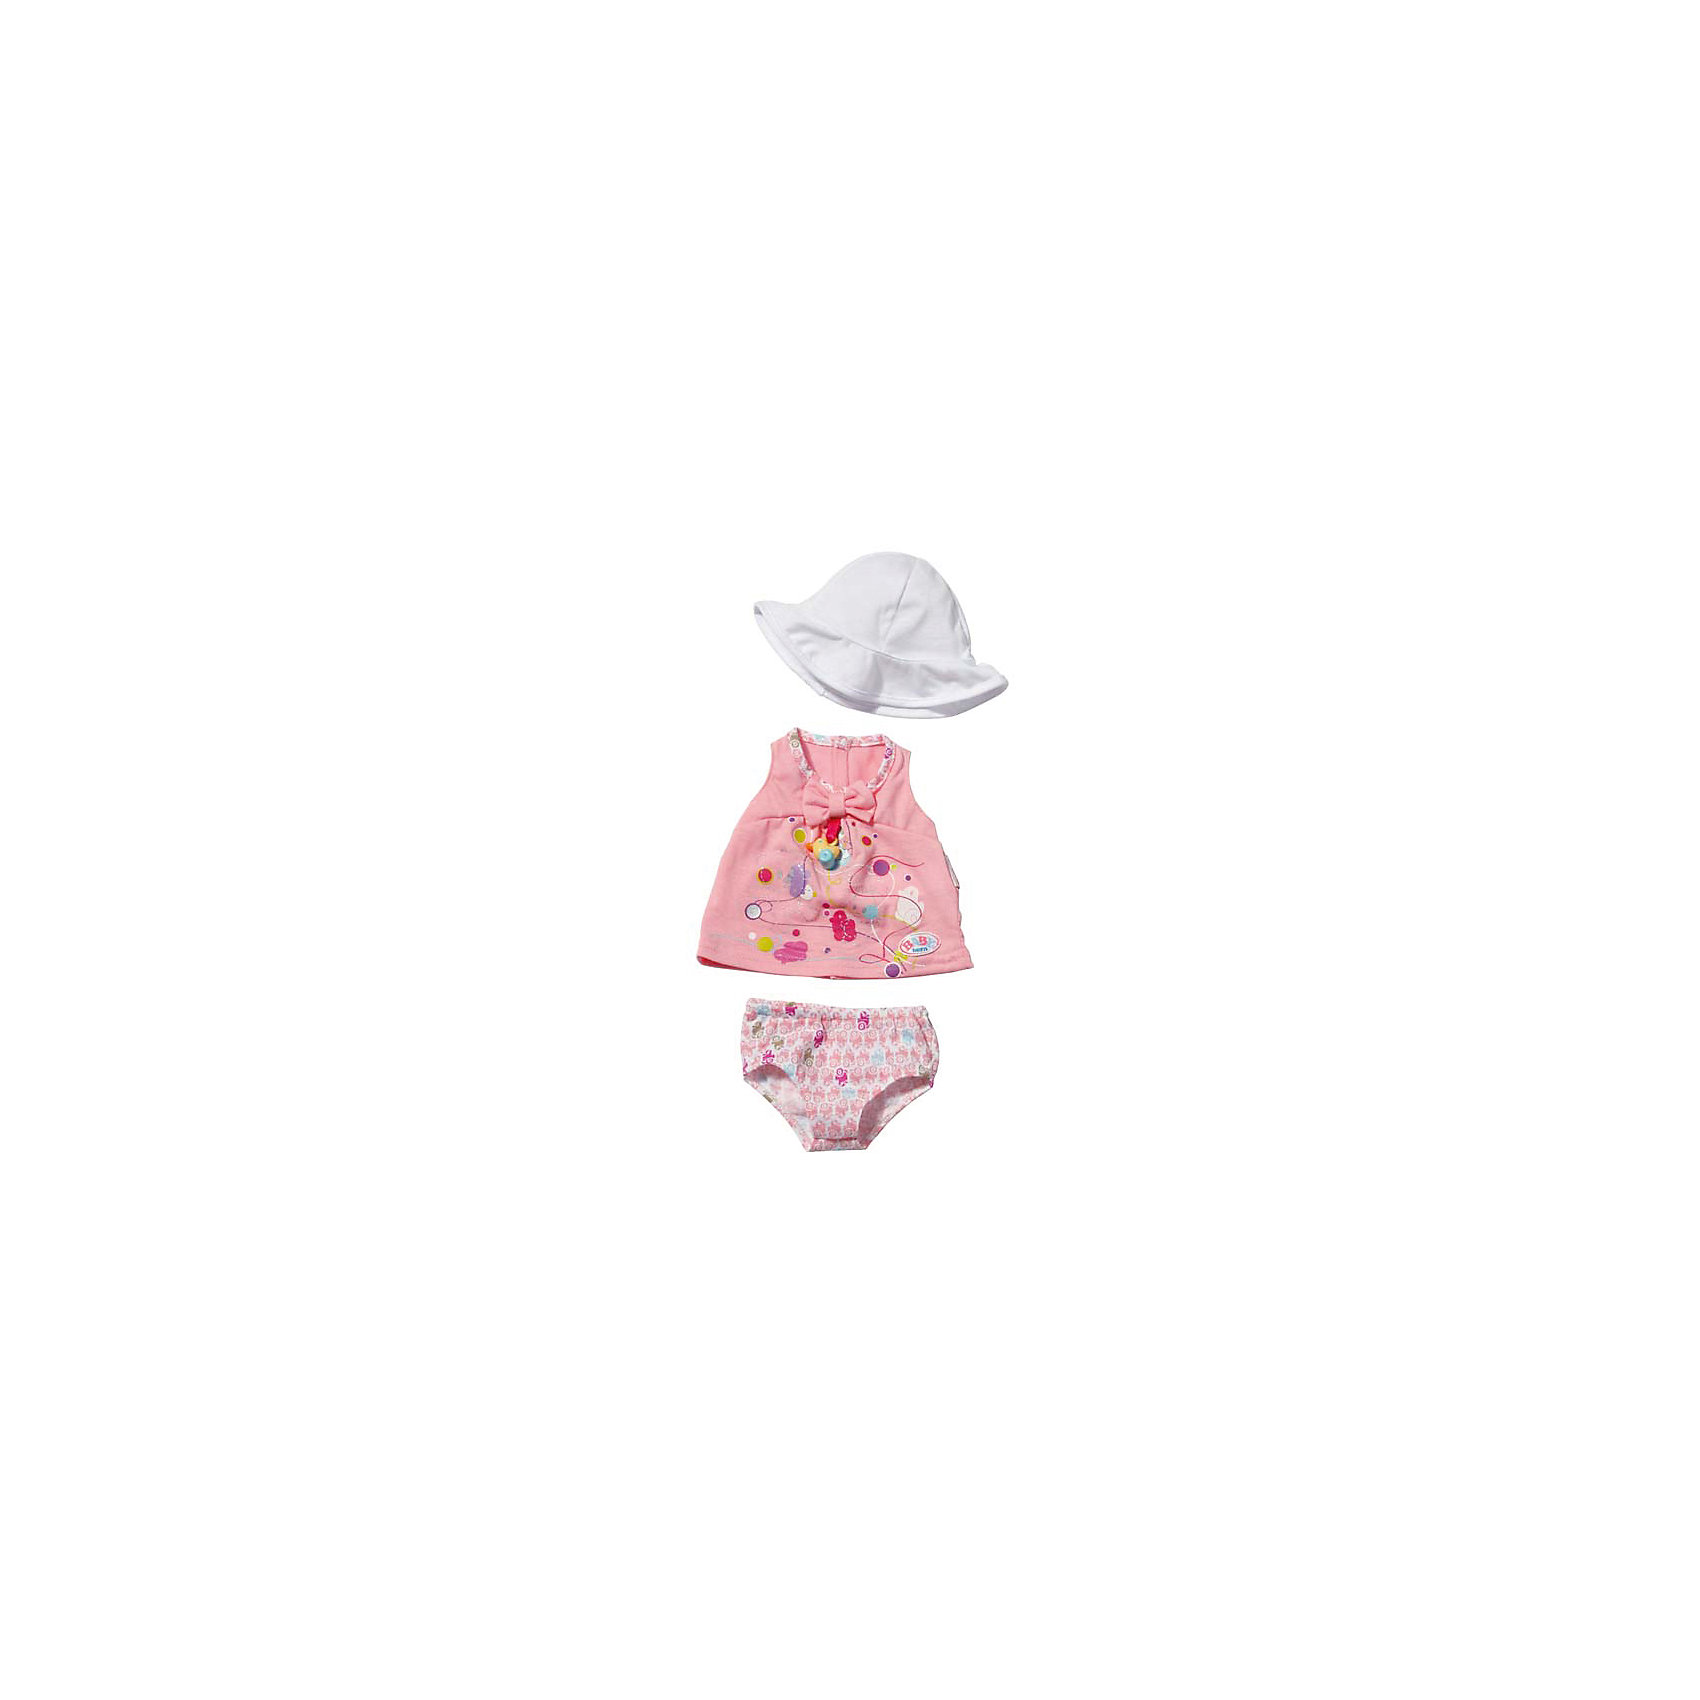 Zapf Creation Летняя одежда для куклы Розовое платье- белая панама, BABY born